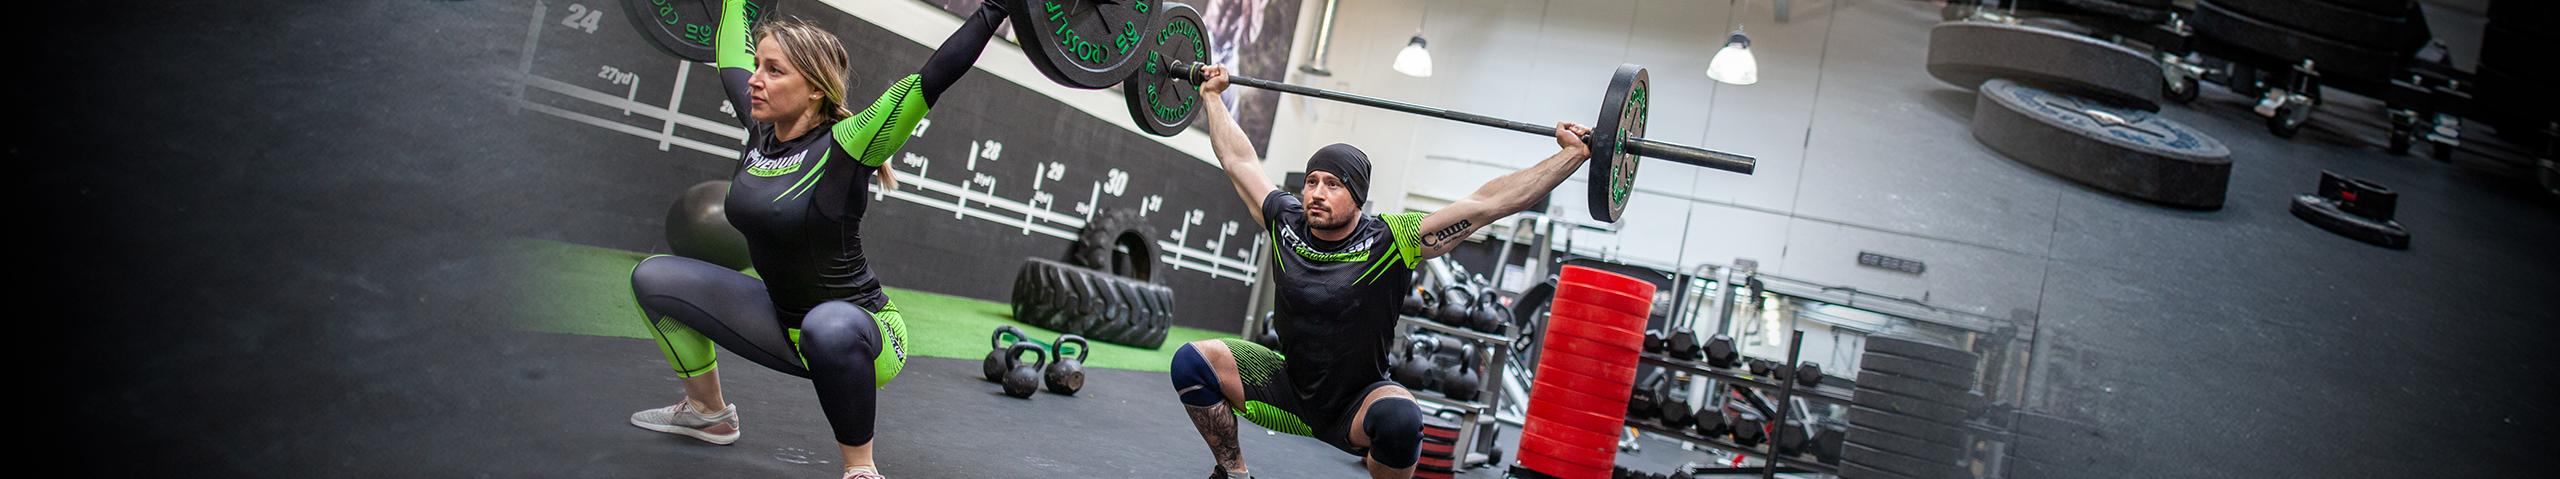 Fitness & cross training (shorts, compression, PTS, tank tops...) | Venum.com Asia